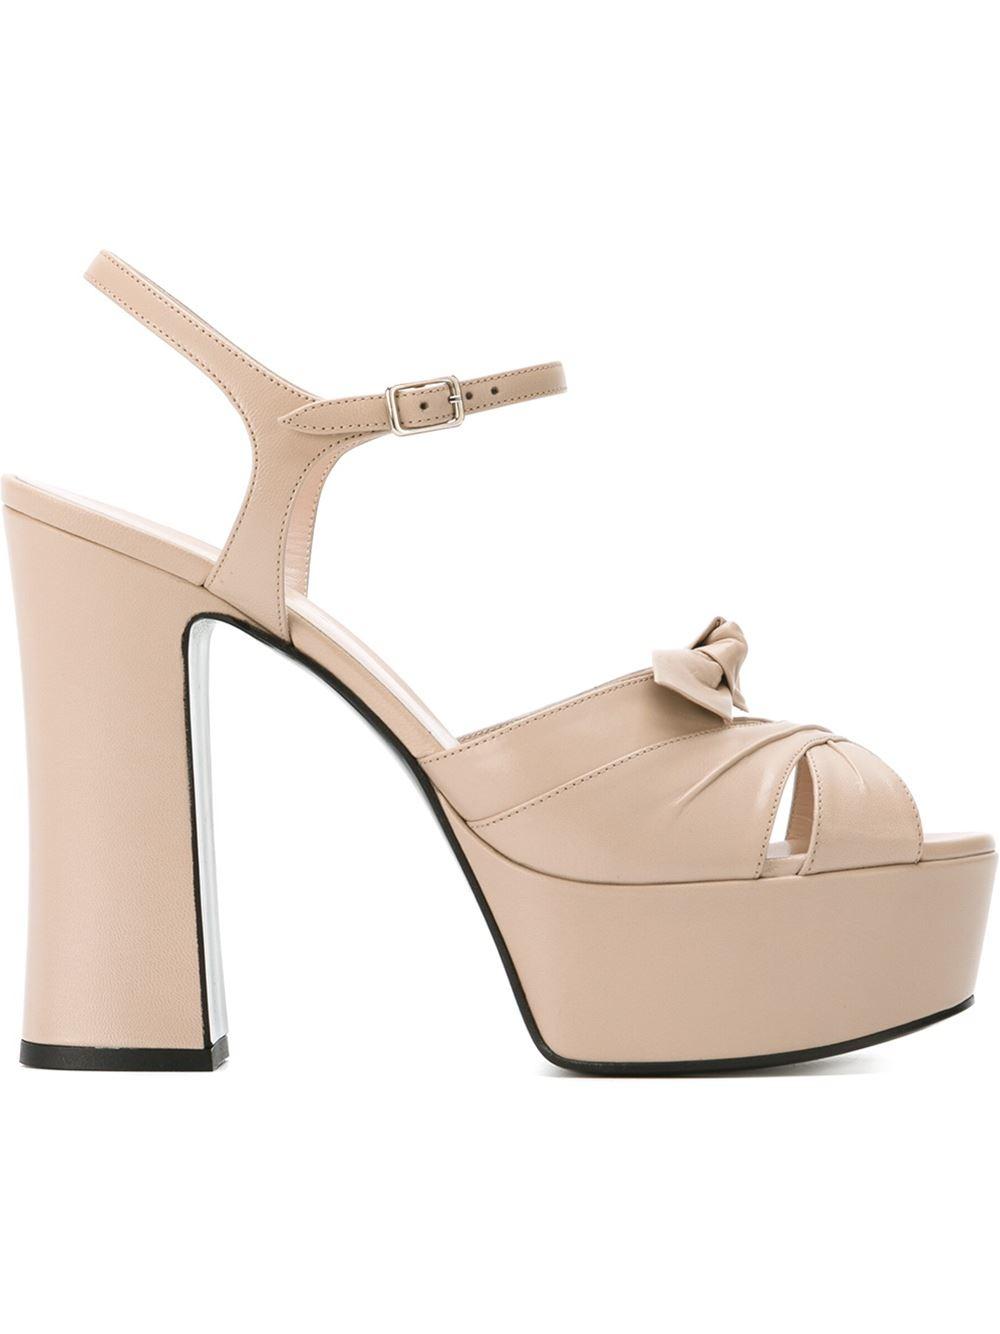 Lyst Saint Laurent Candy Platform Sandals In Pink